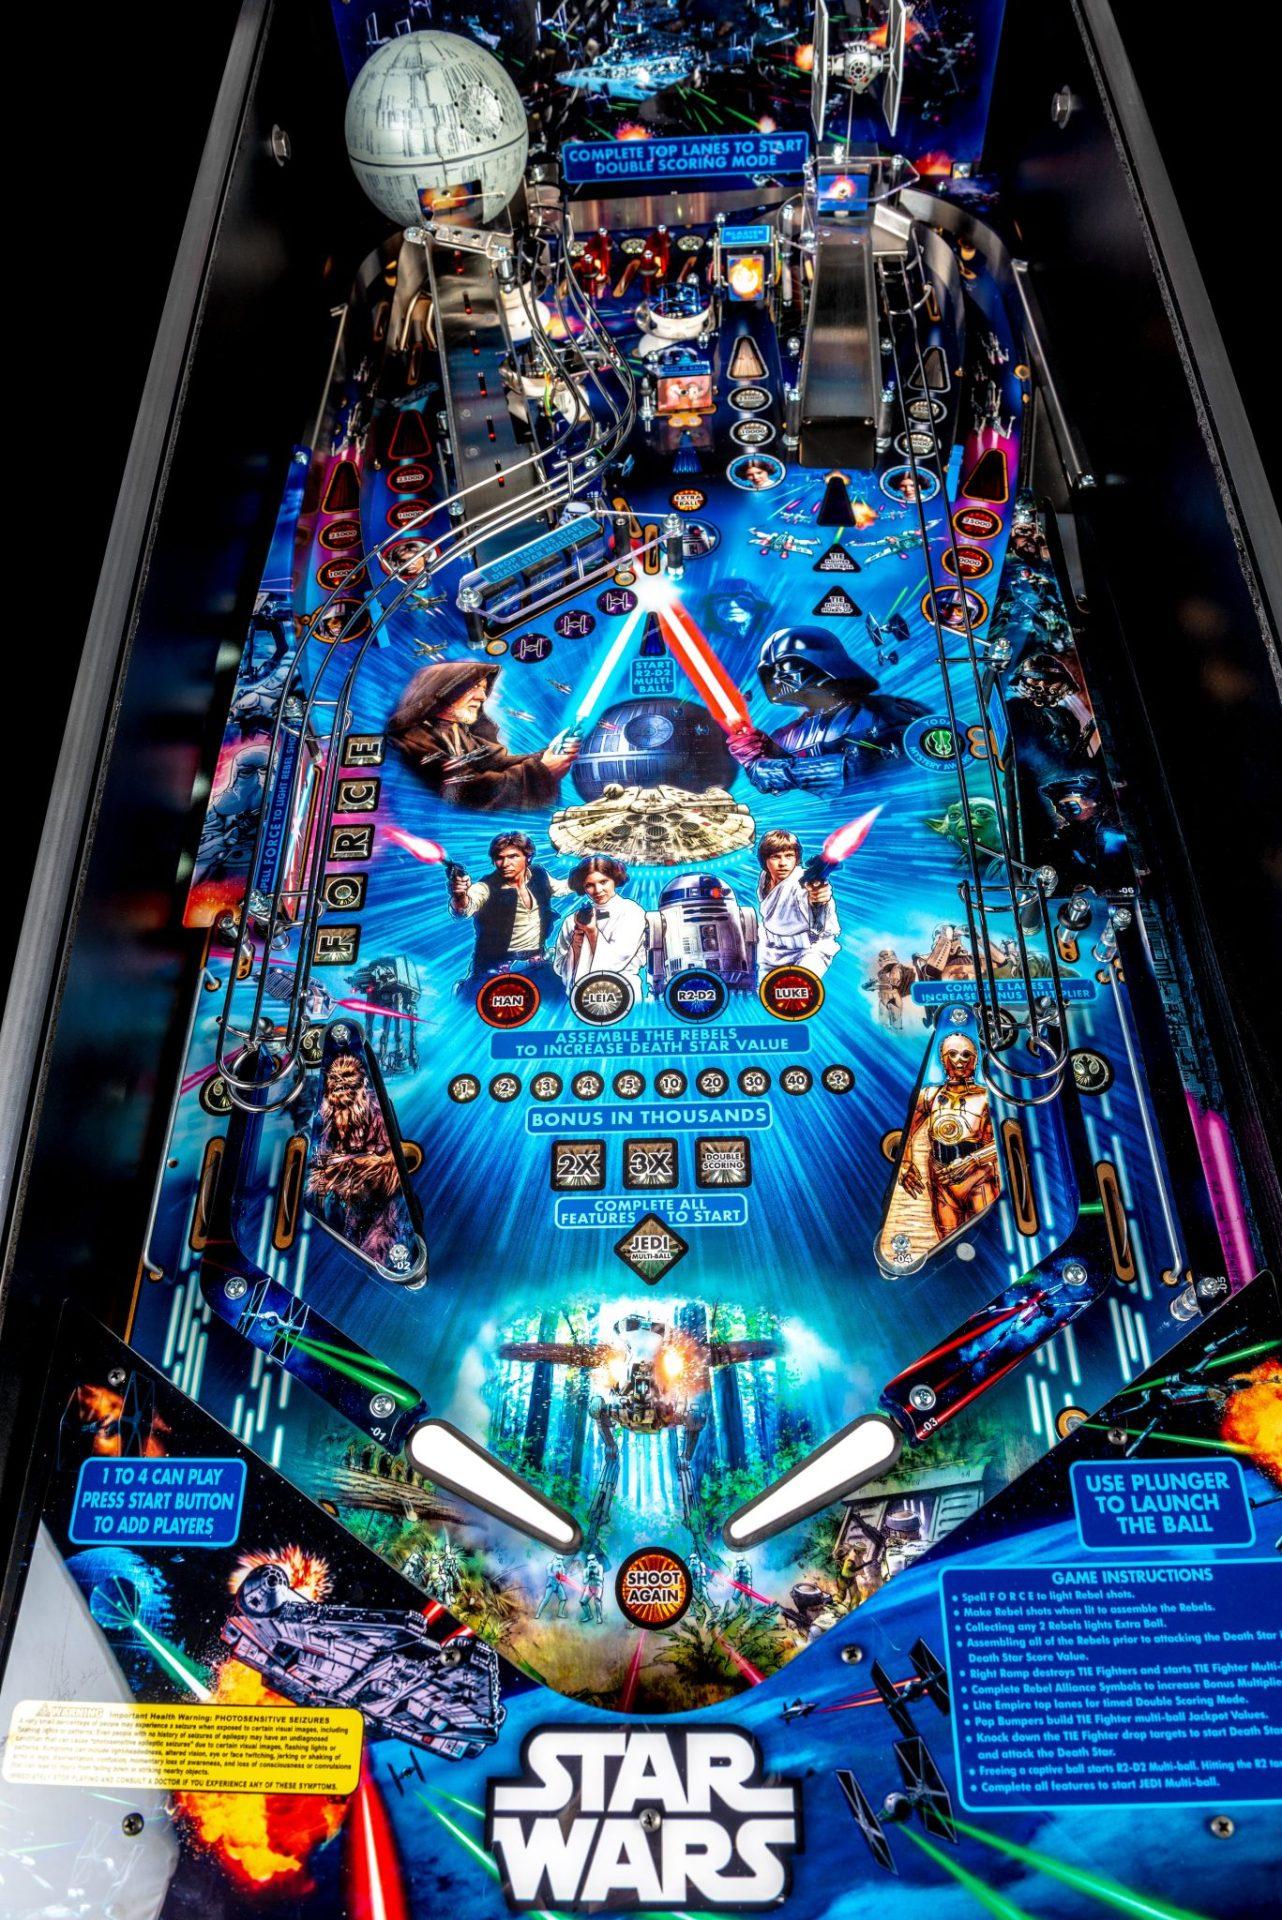 Star Wars Pin Stern Home Edition Pinball Machine